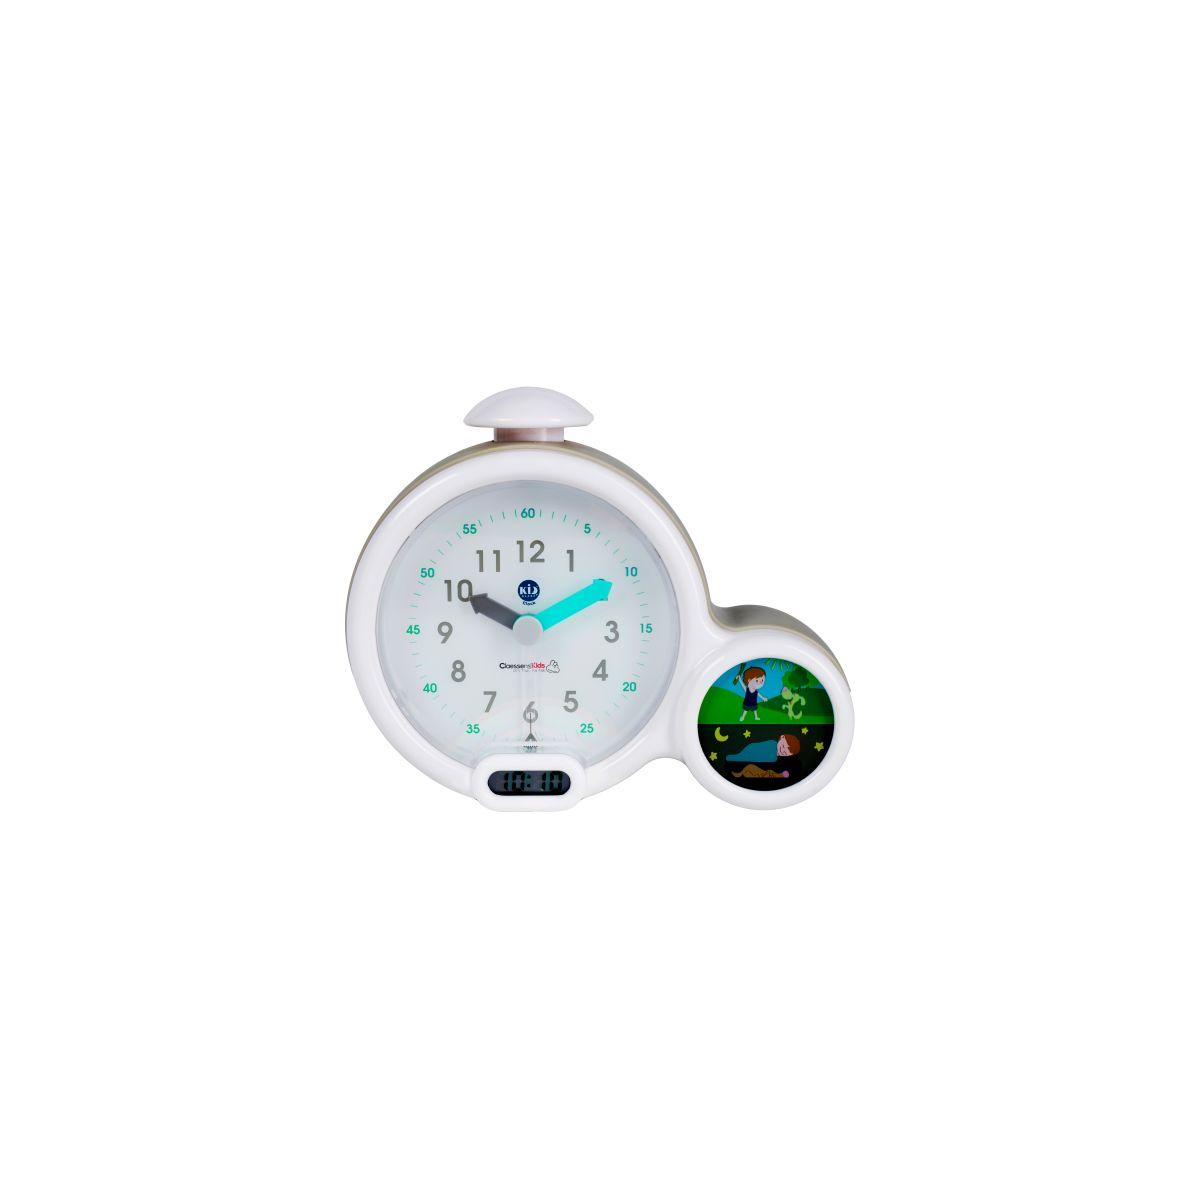 R�veil enfant kid'sleep clock gris - livraison offerte : code premium